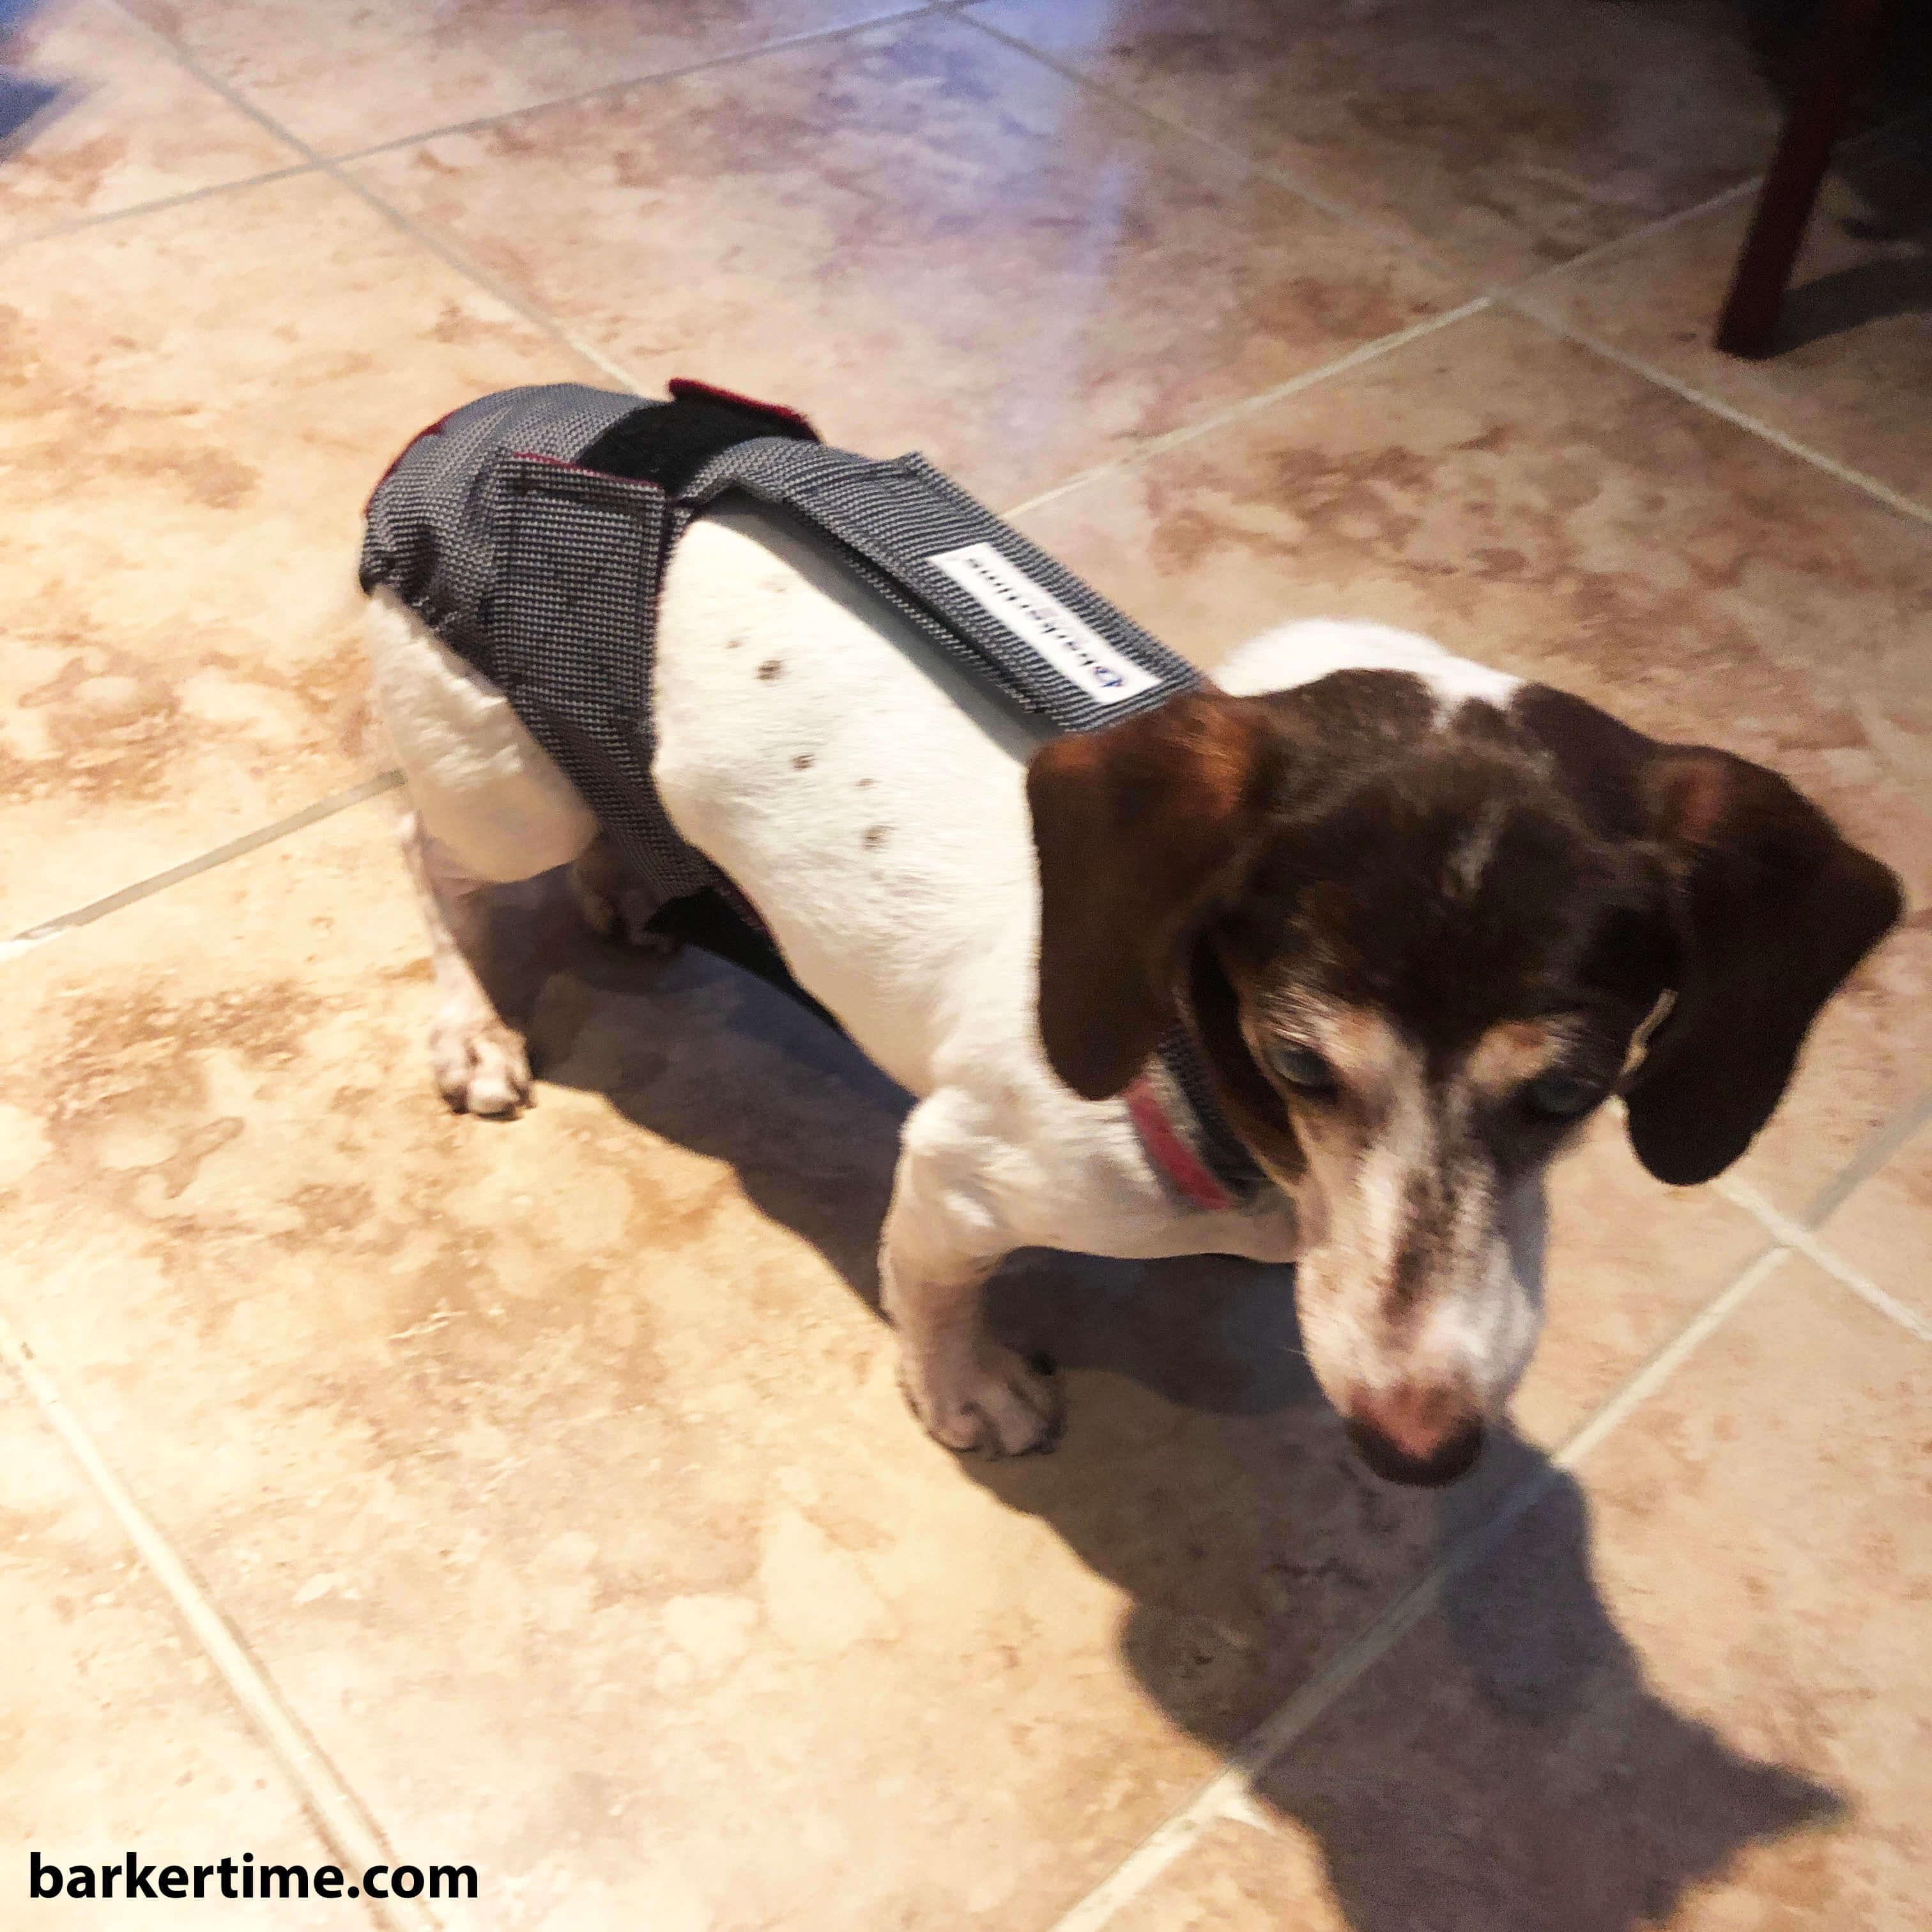 dachshund dog diaper